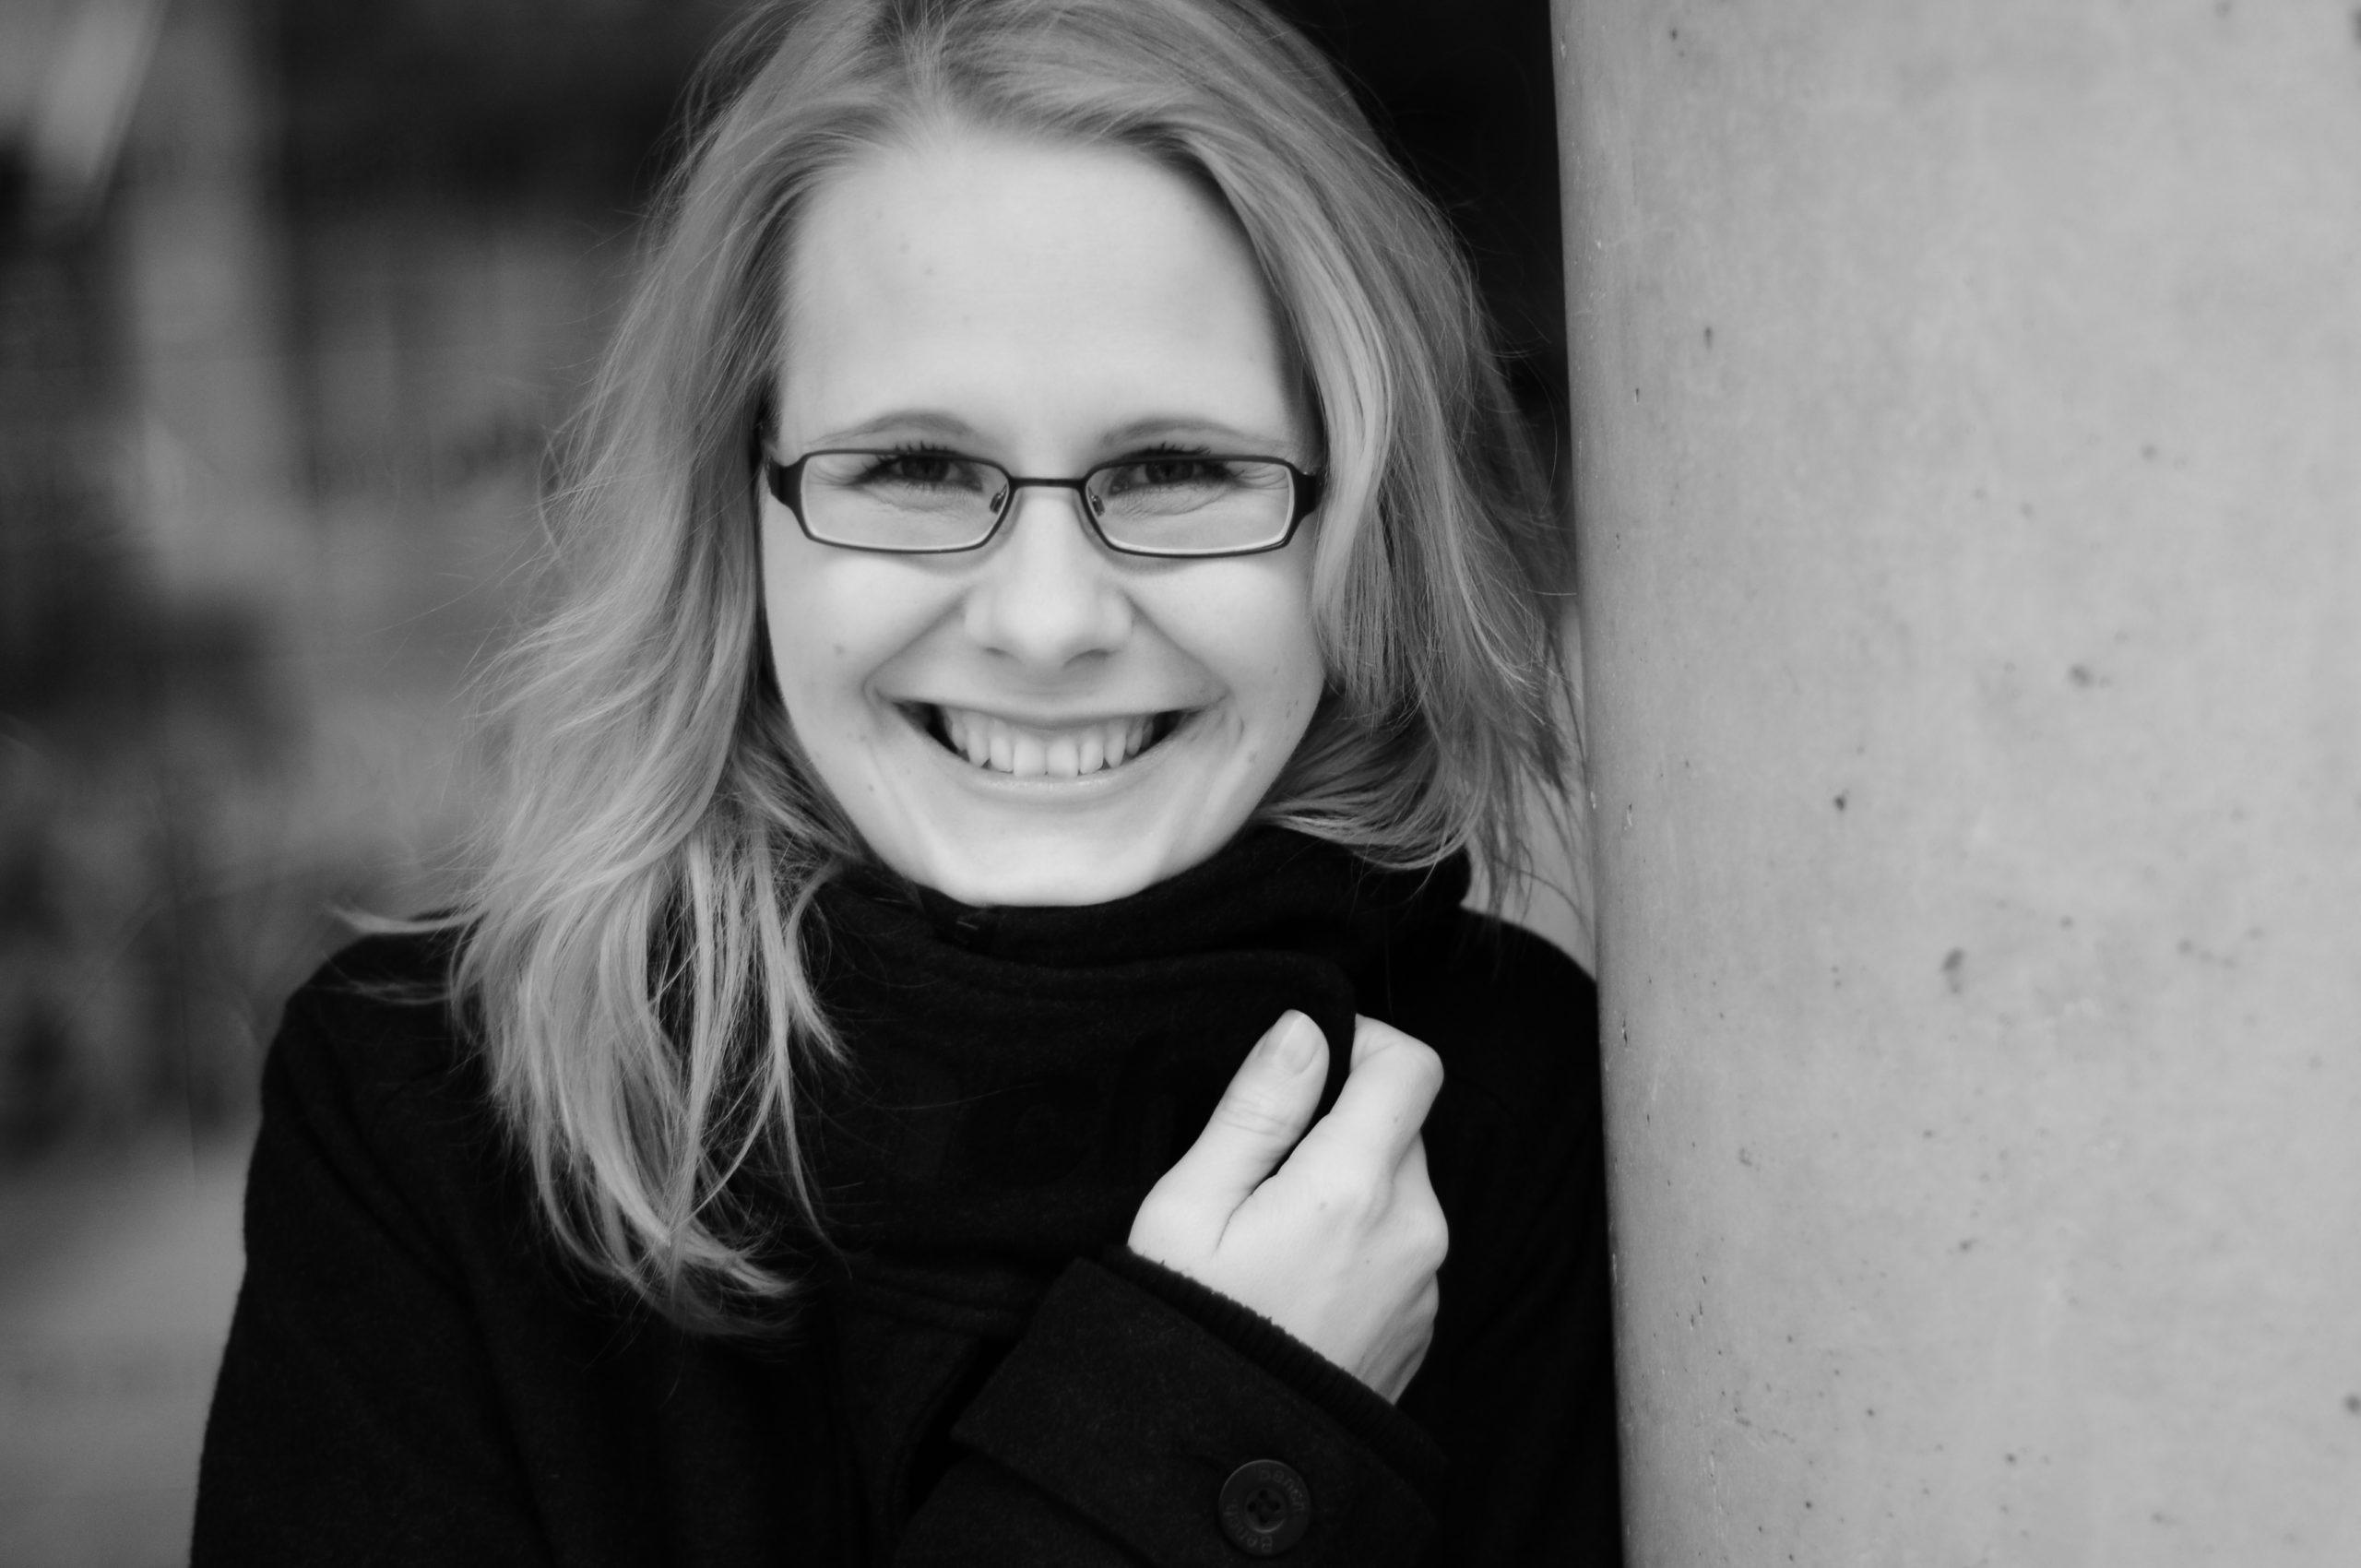 Kerstin Weisemann